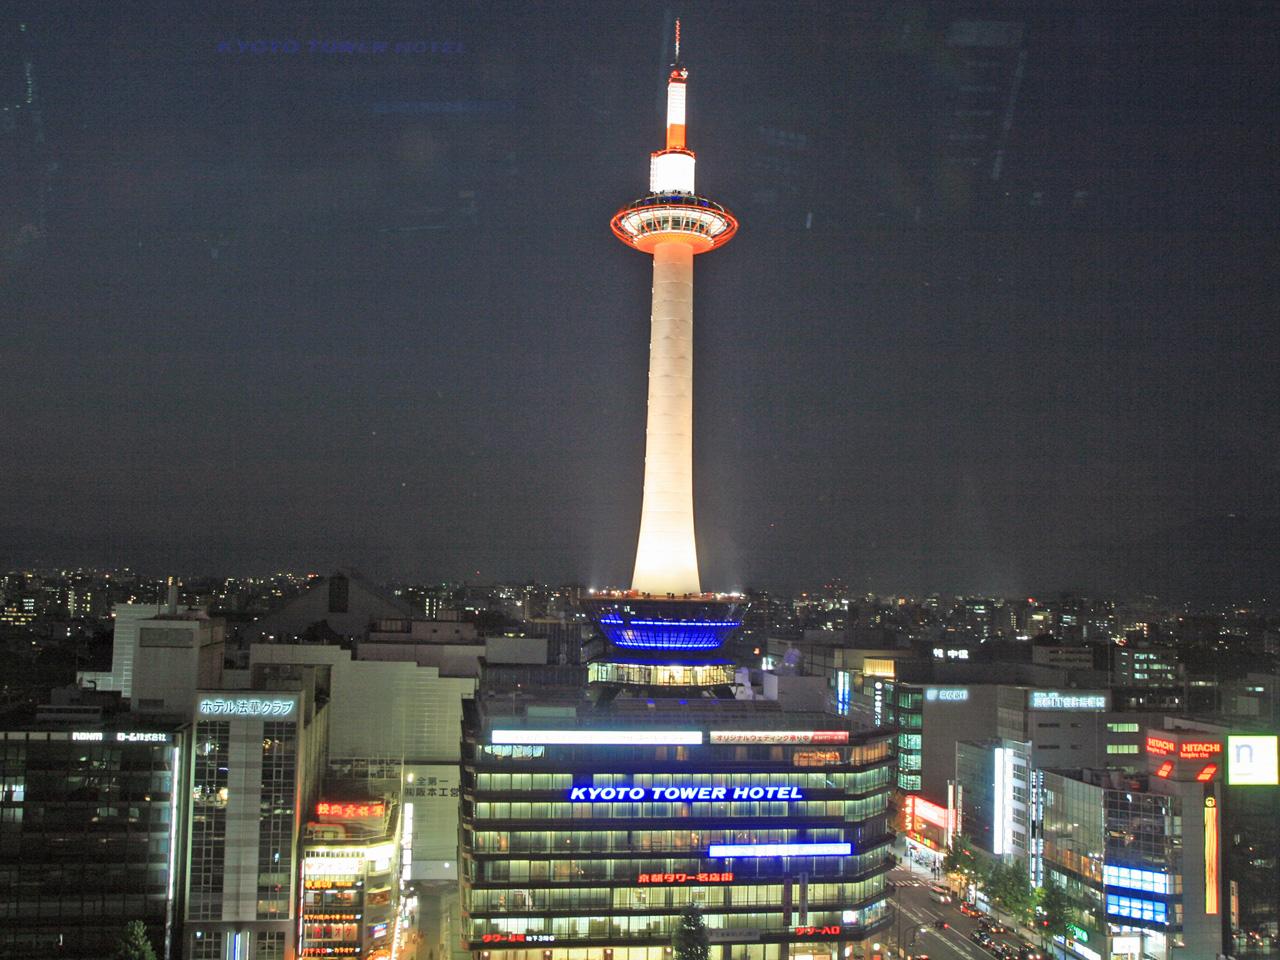 A-Kyoto 12A